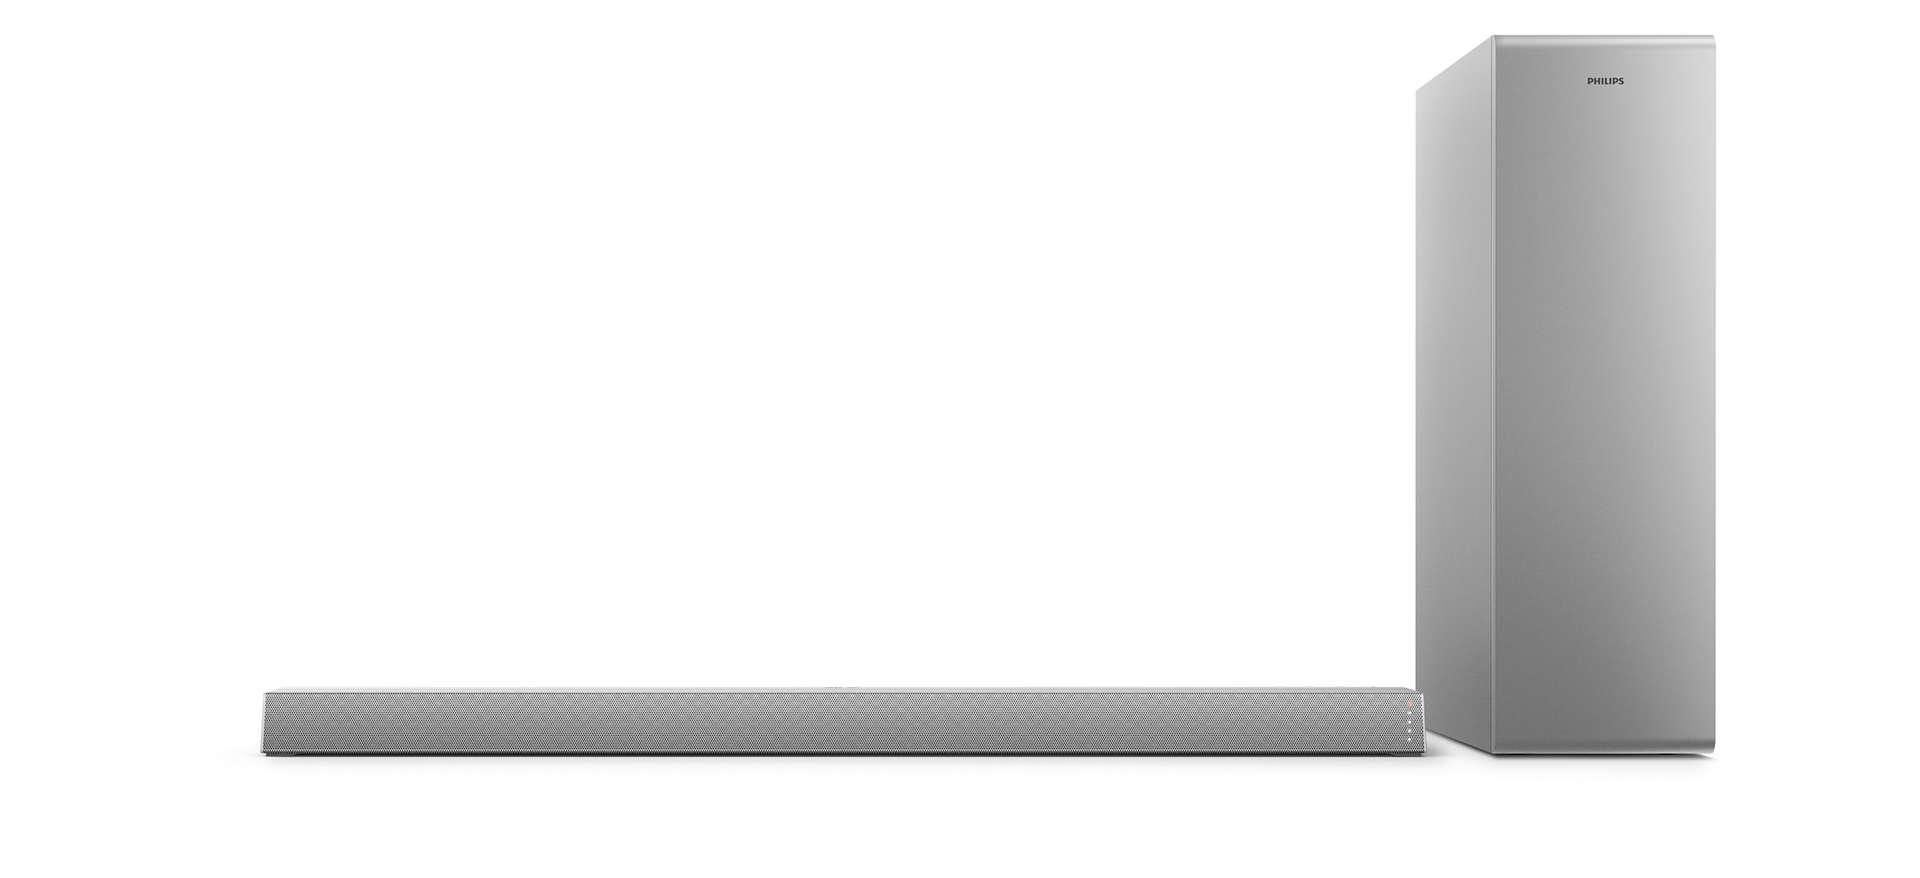 Philips TAB6405 Slim Sound Bar 2.1 CH Wireless Subwoofer